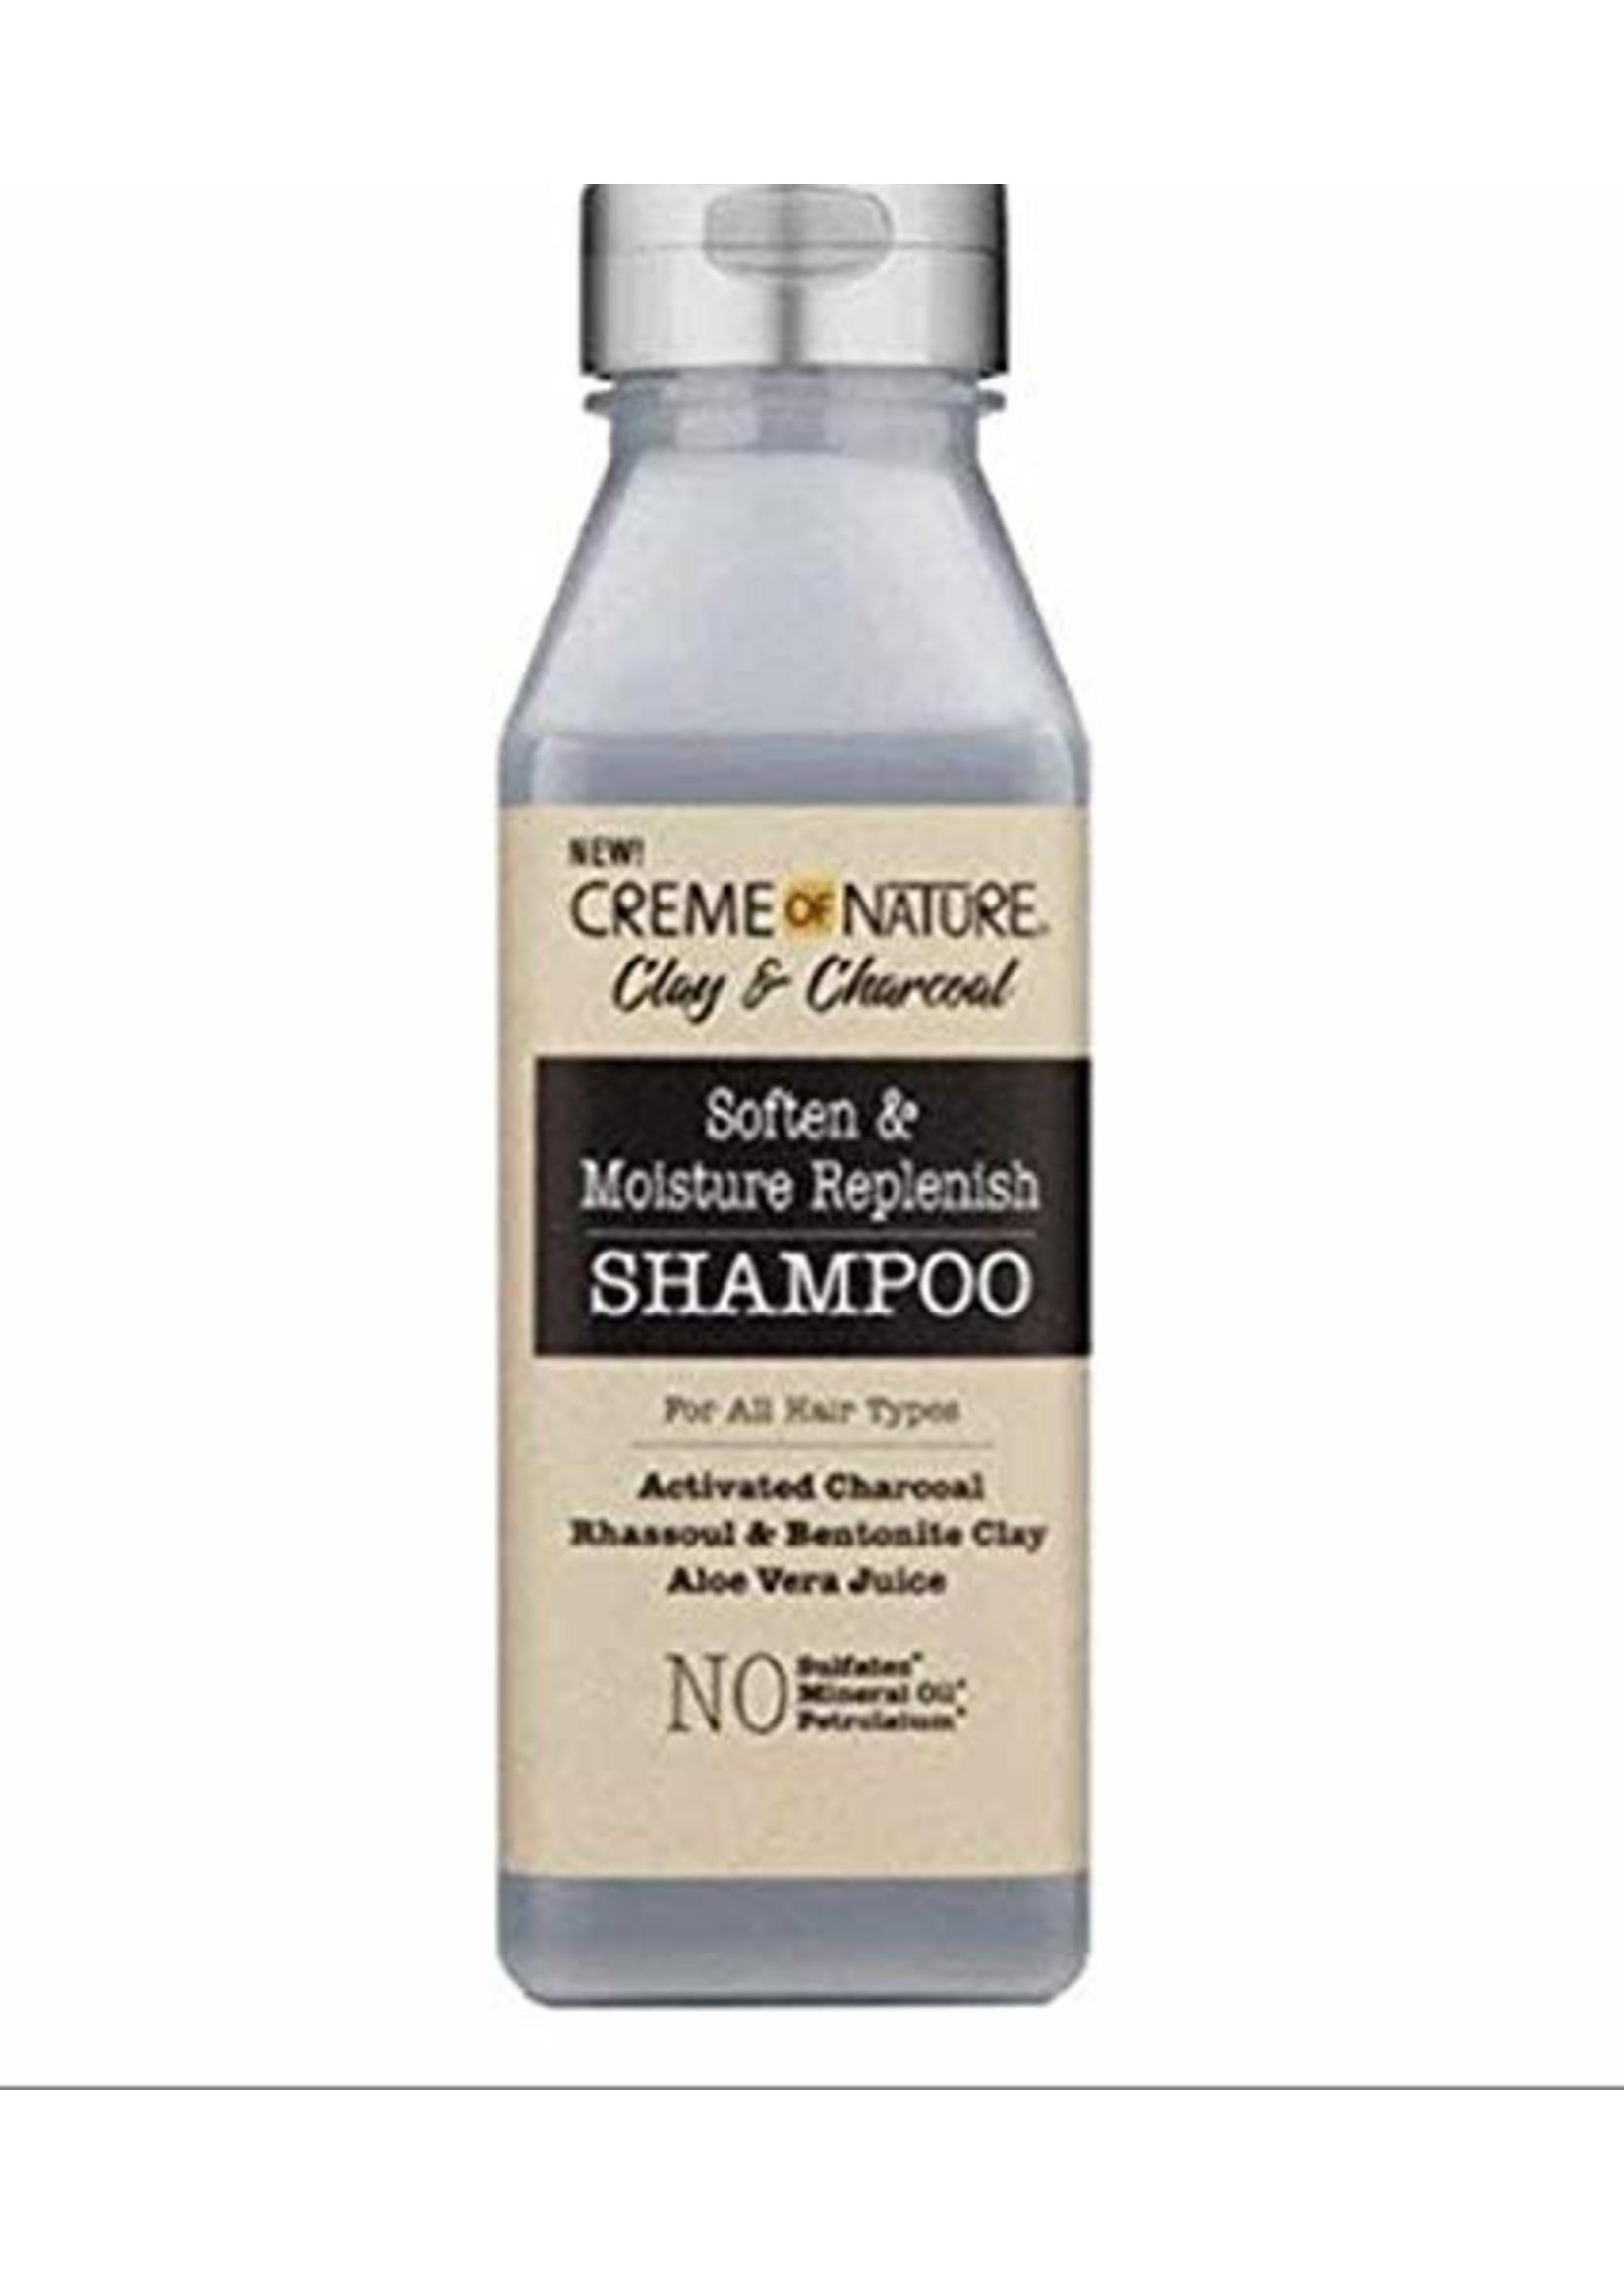 Cream of Nature Clay & Charcoal Shampoo